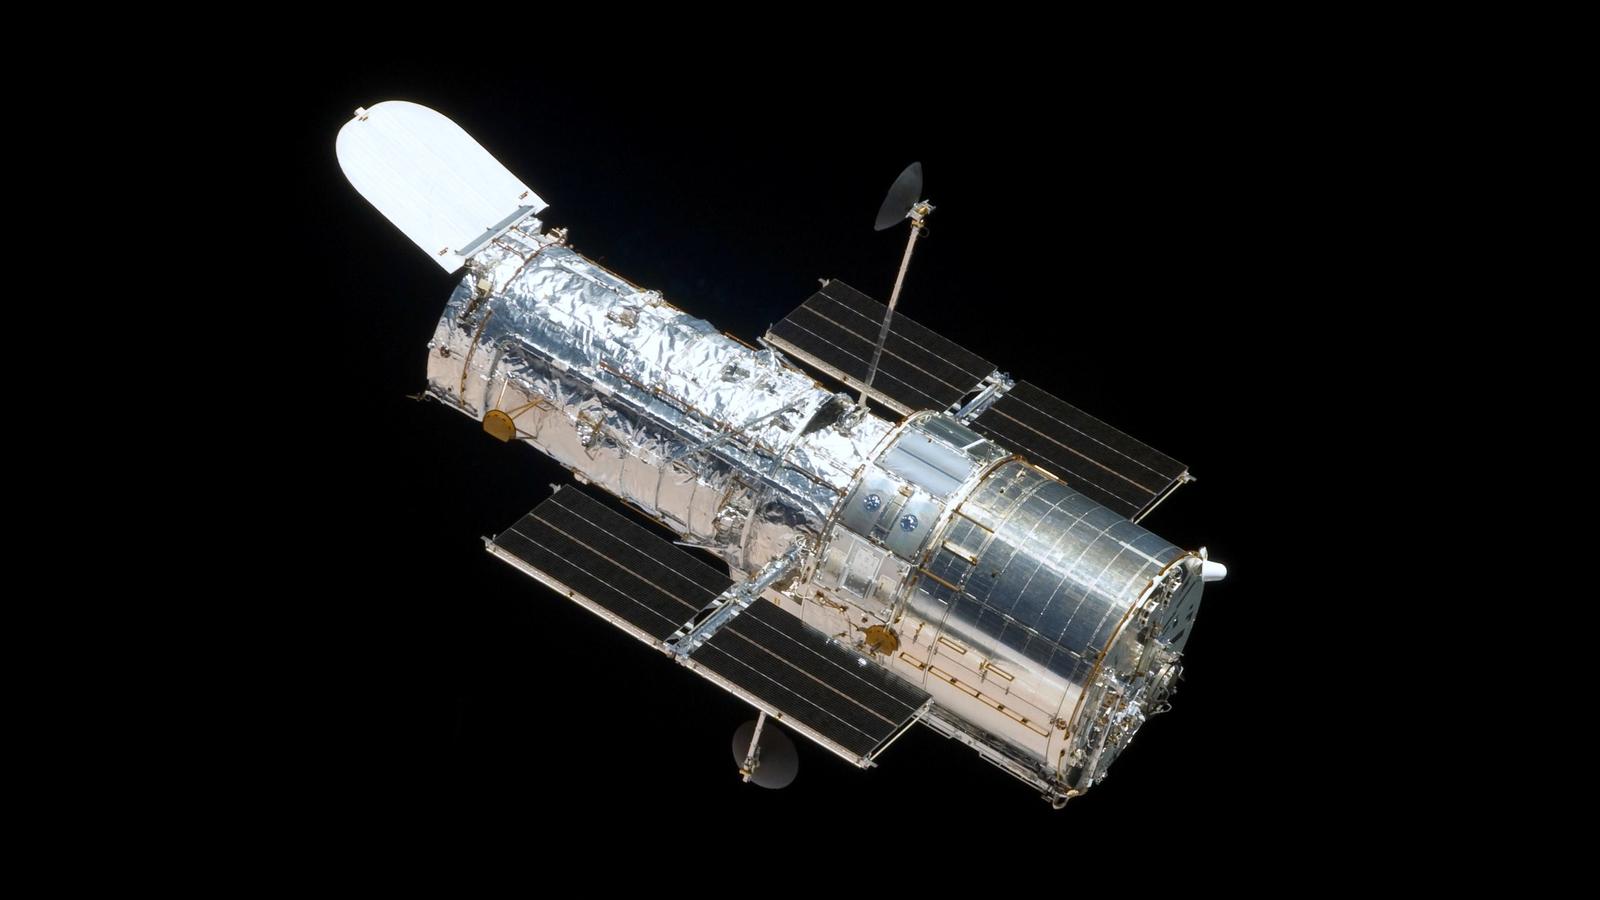 Telescópio espacial Hubble. Crédito: NASA/ESA